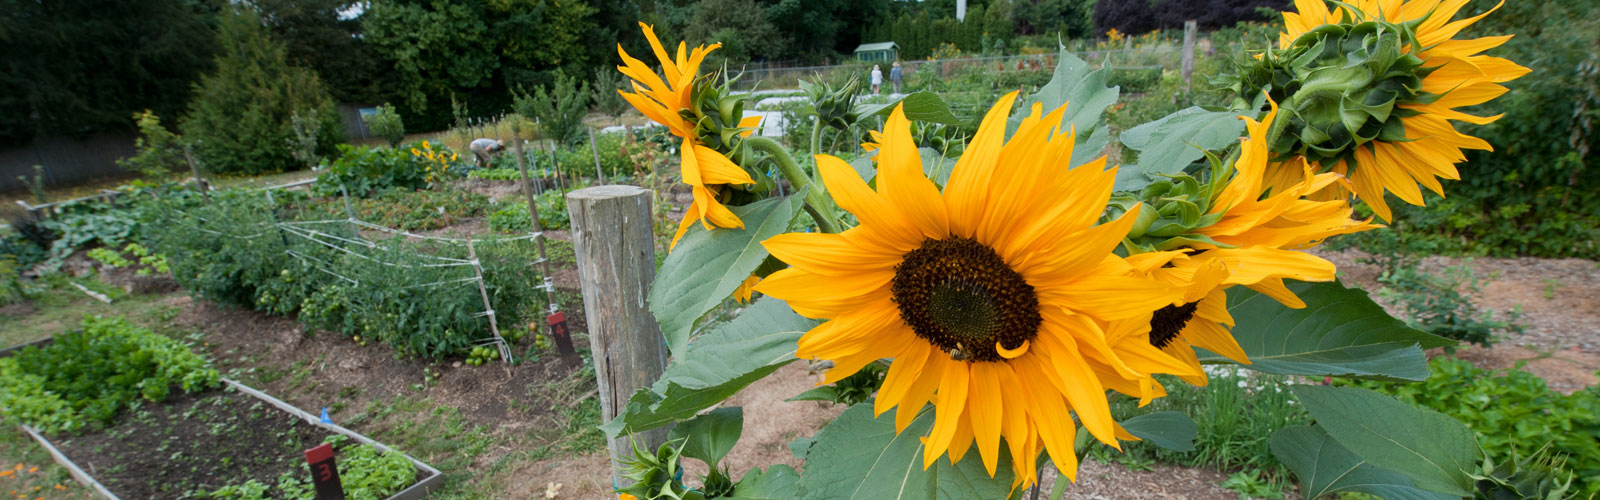 sunflower plant with garden in background